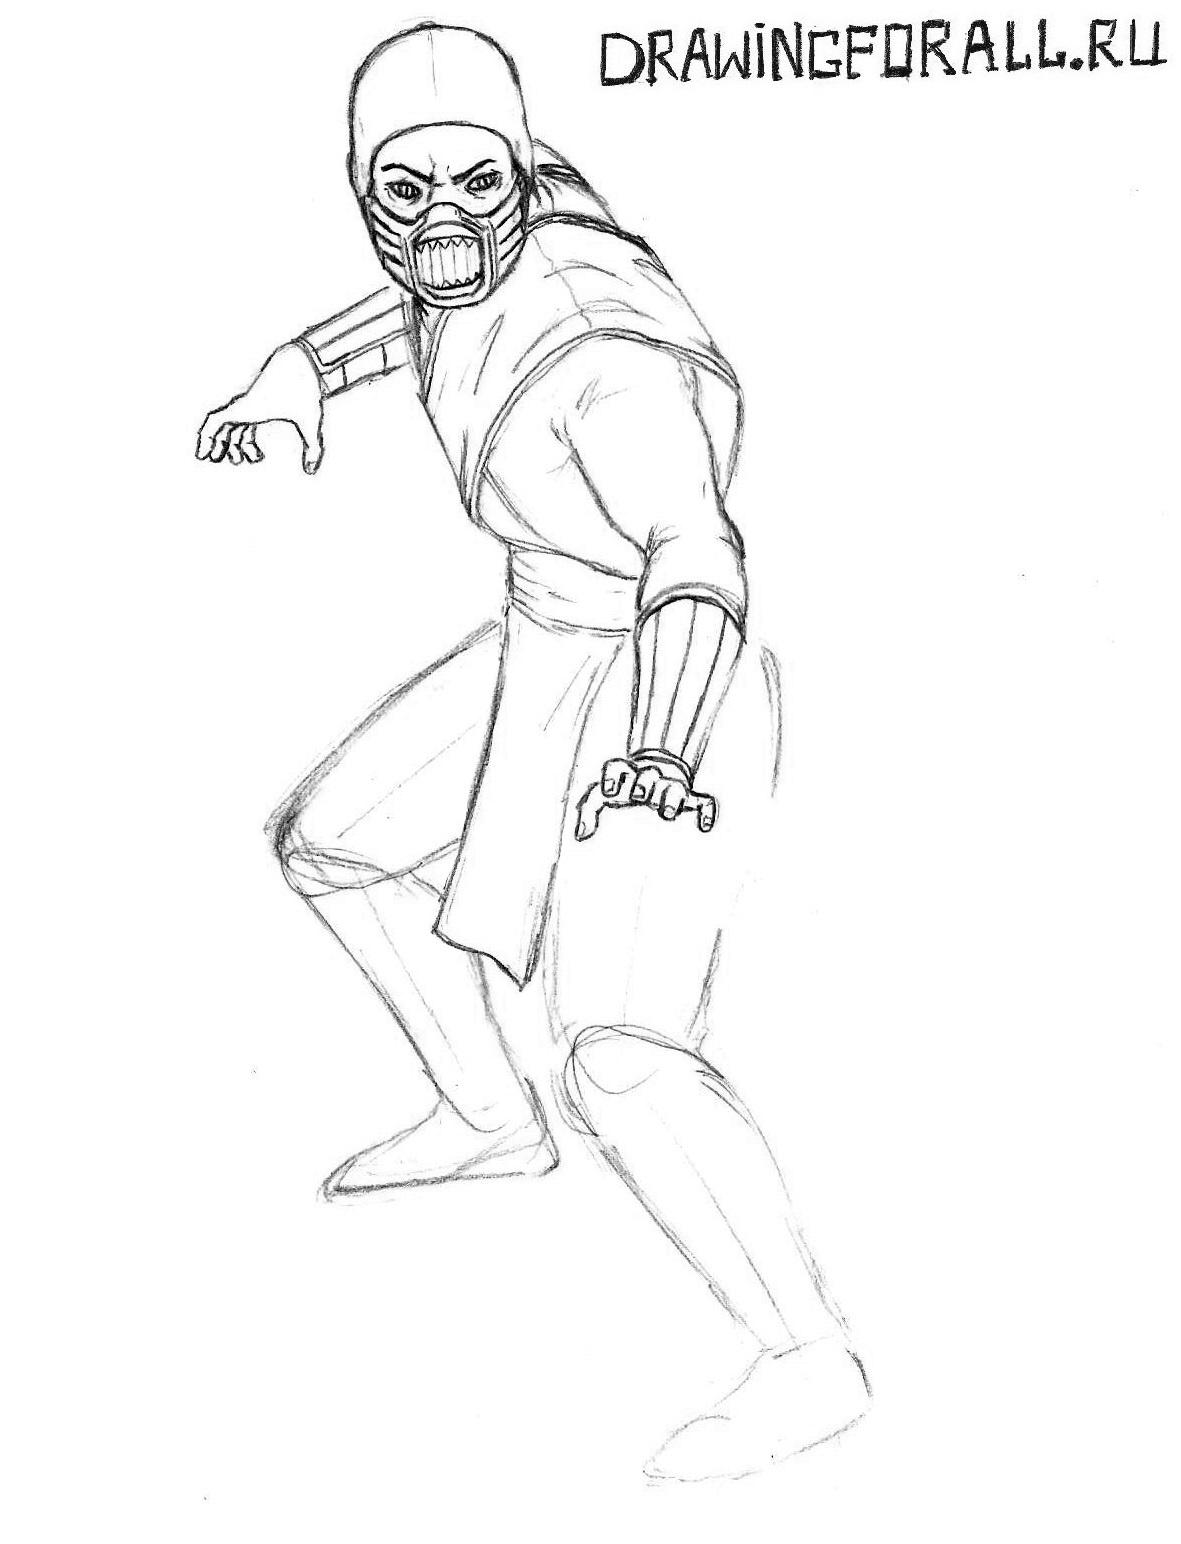 как нарисовать рептилию карандашом мортал комбат